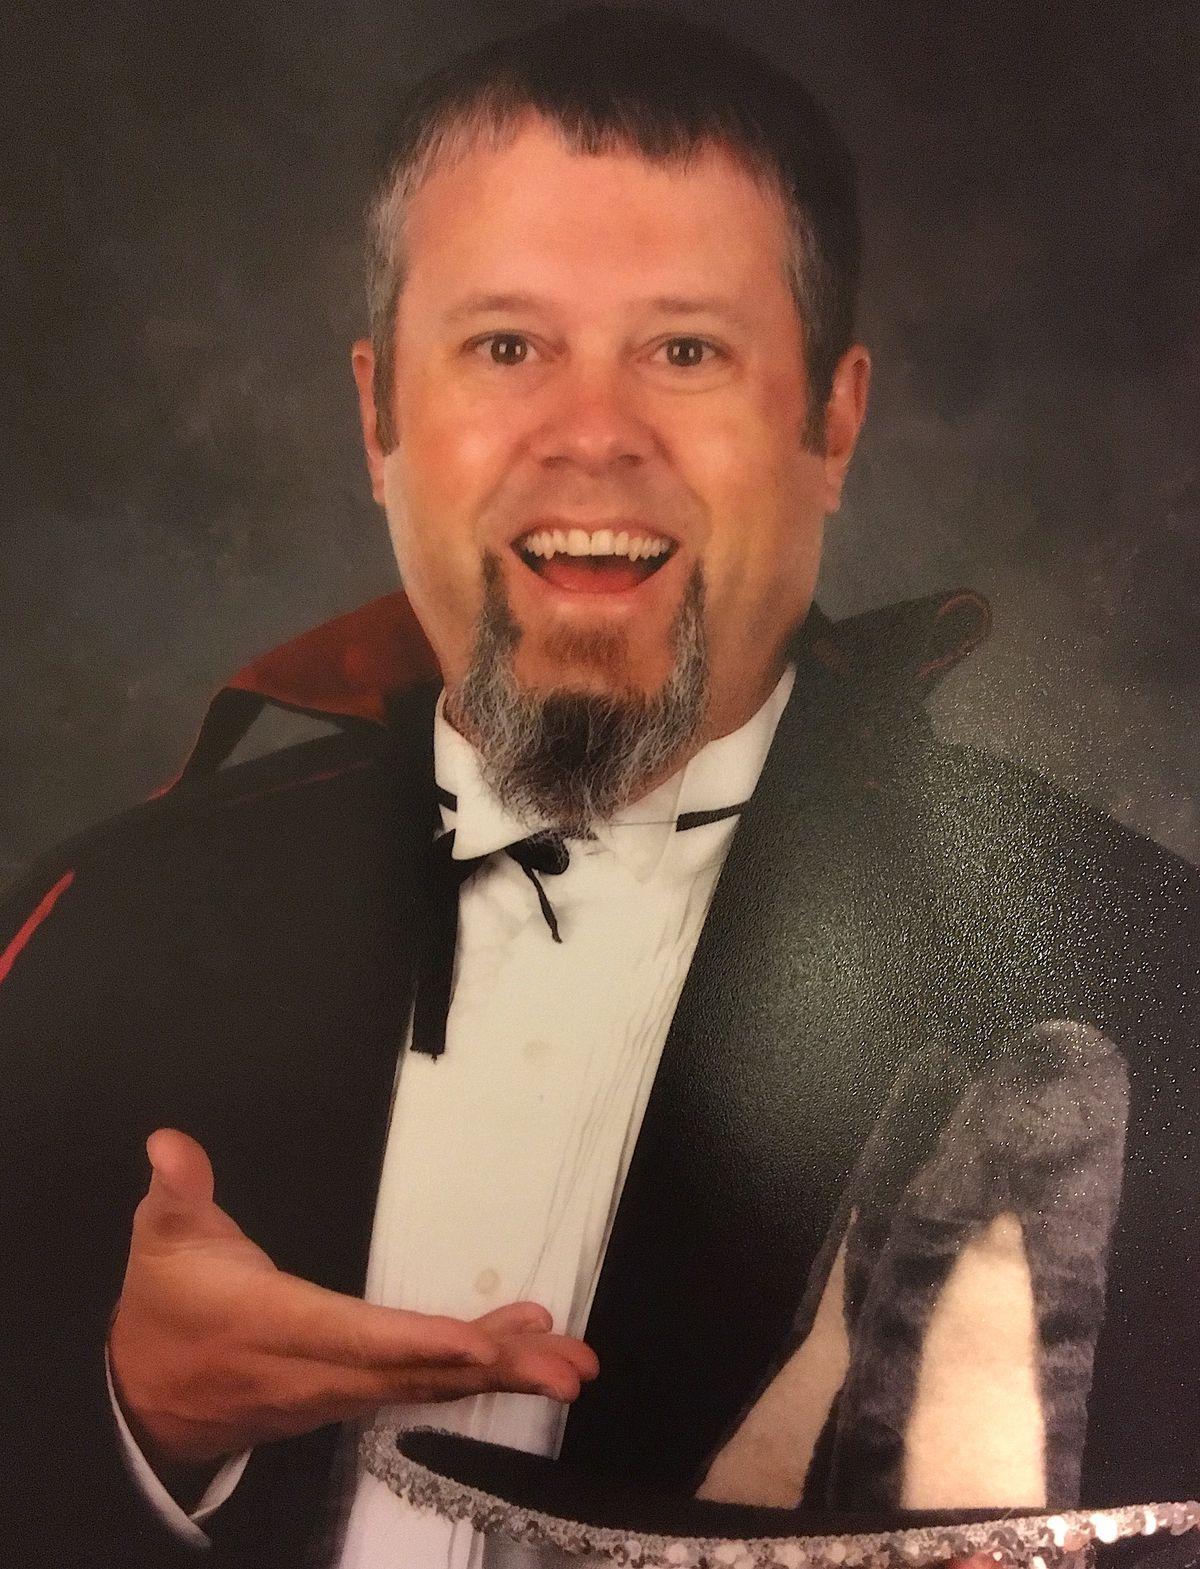 Music teacher Justin Bankey dressed as a magician